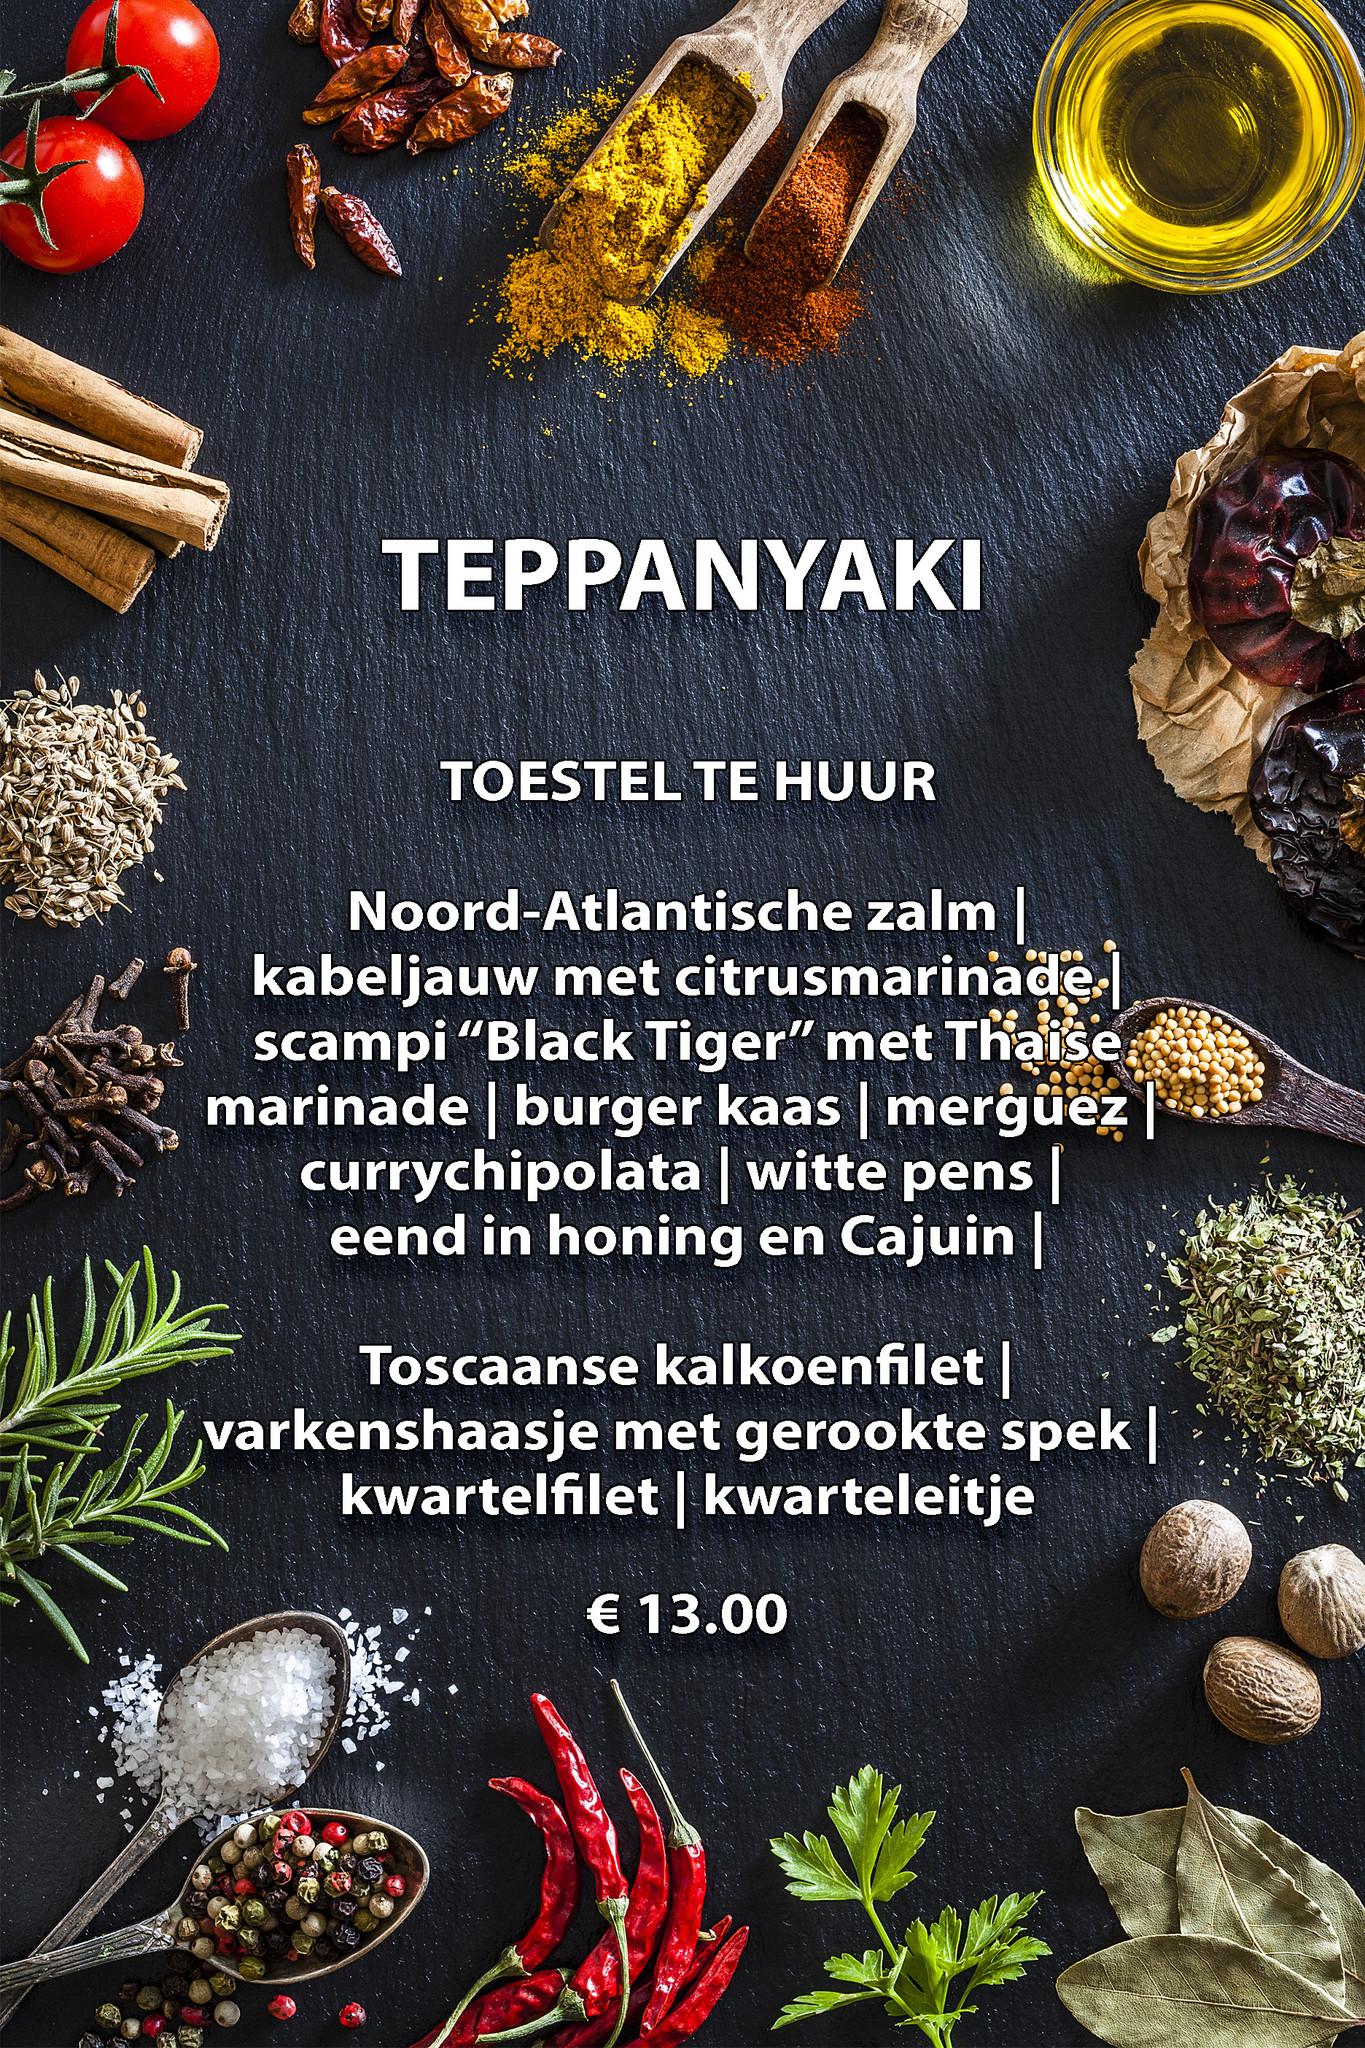 Teppanyaki-1